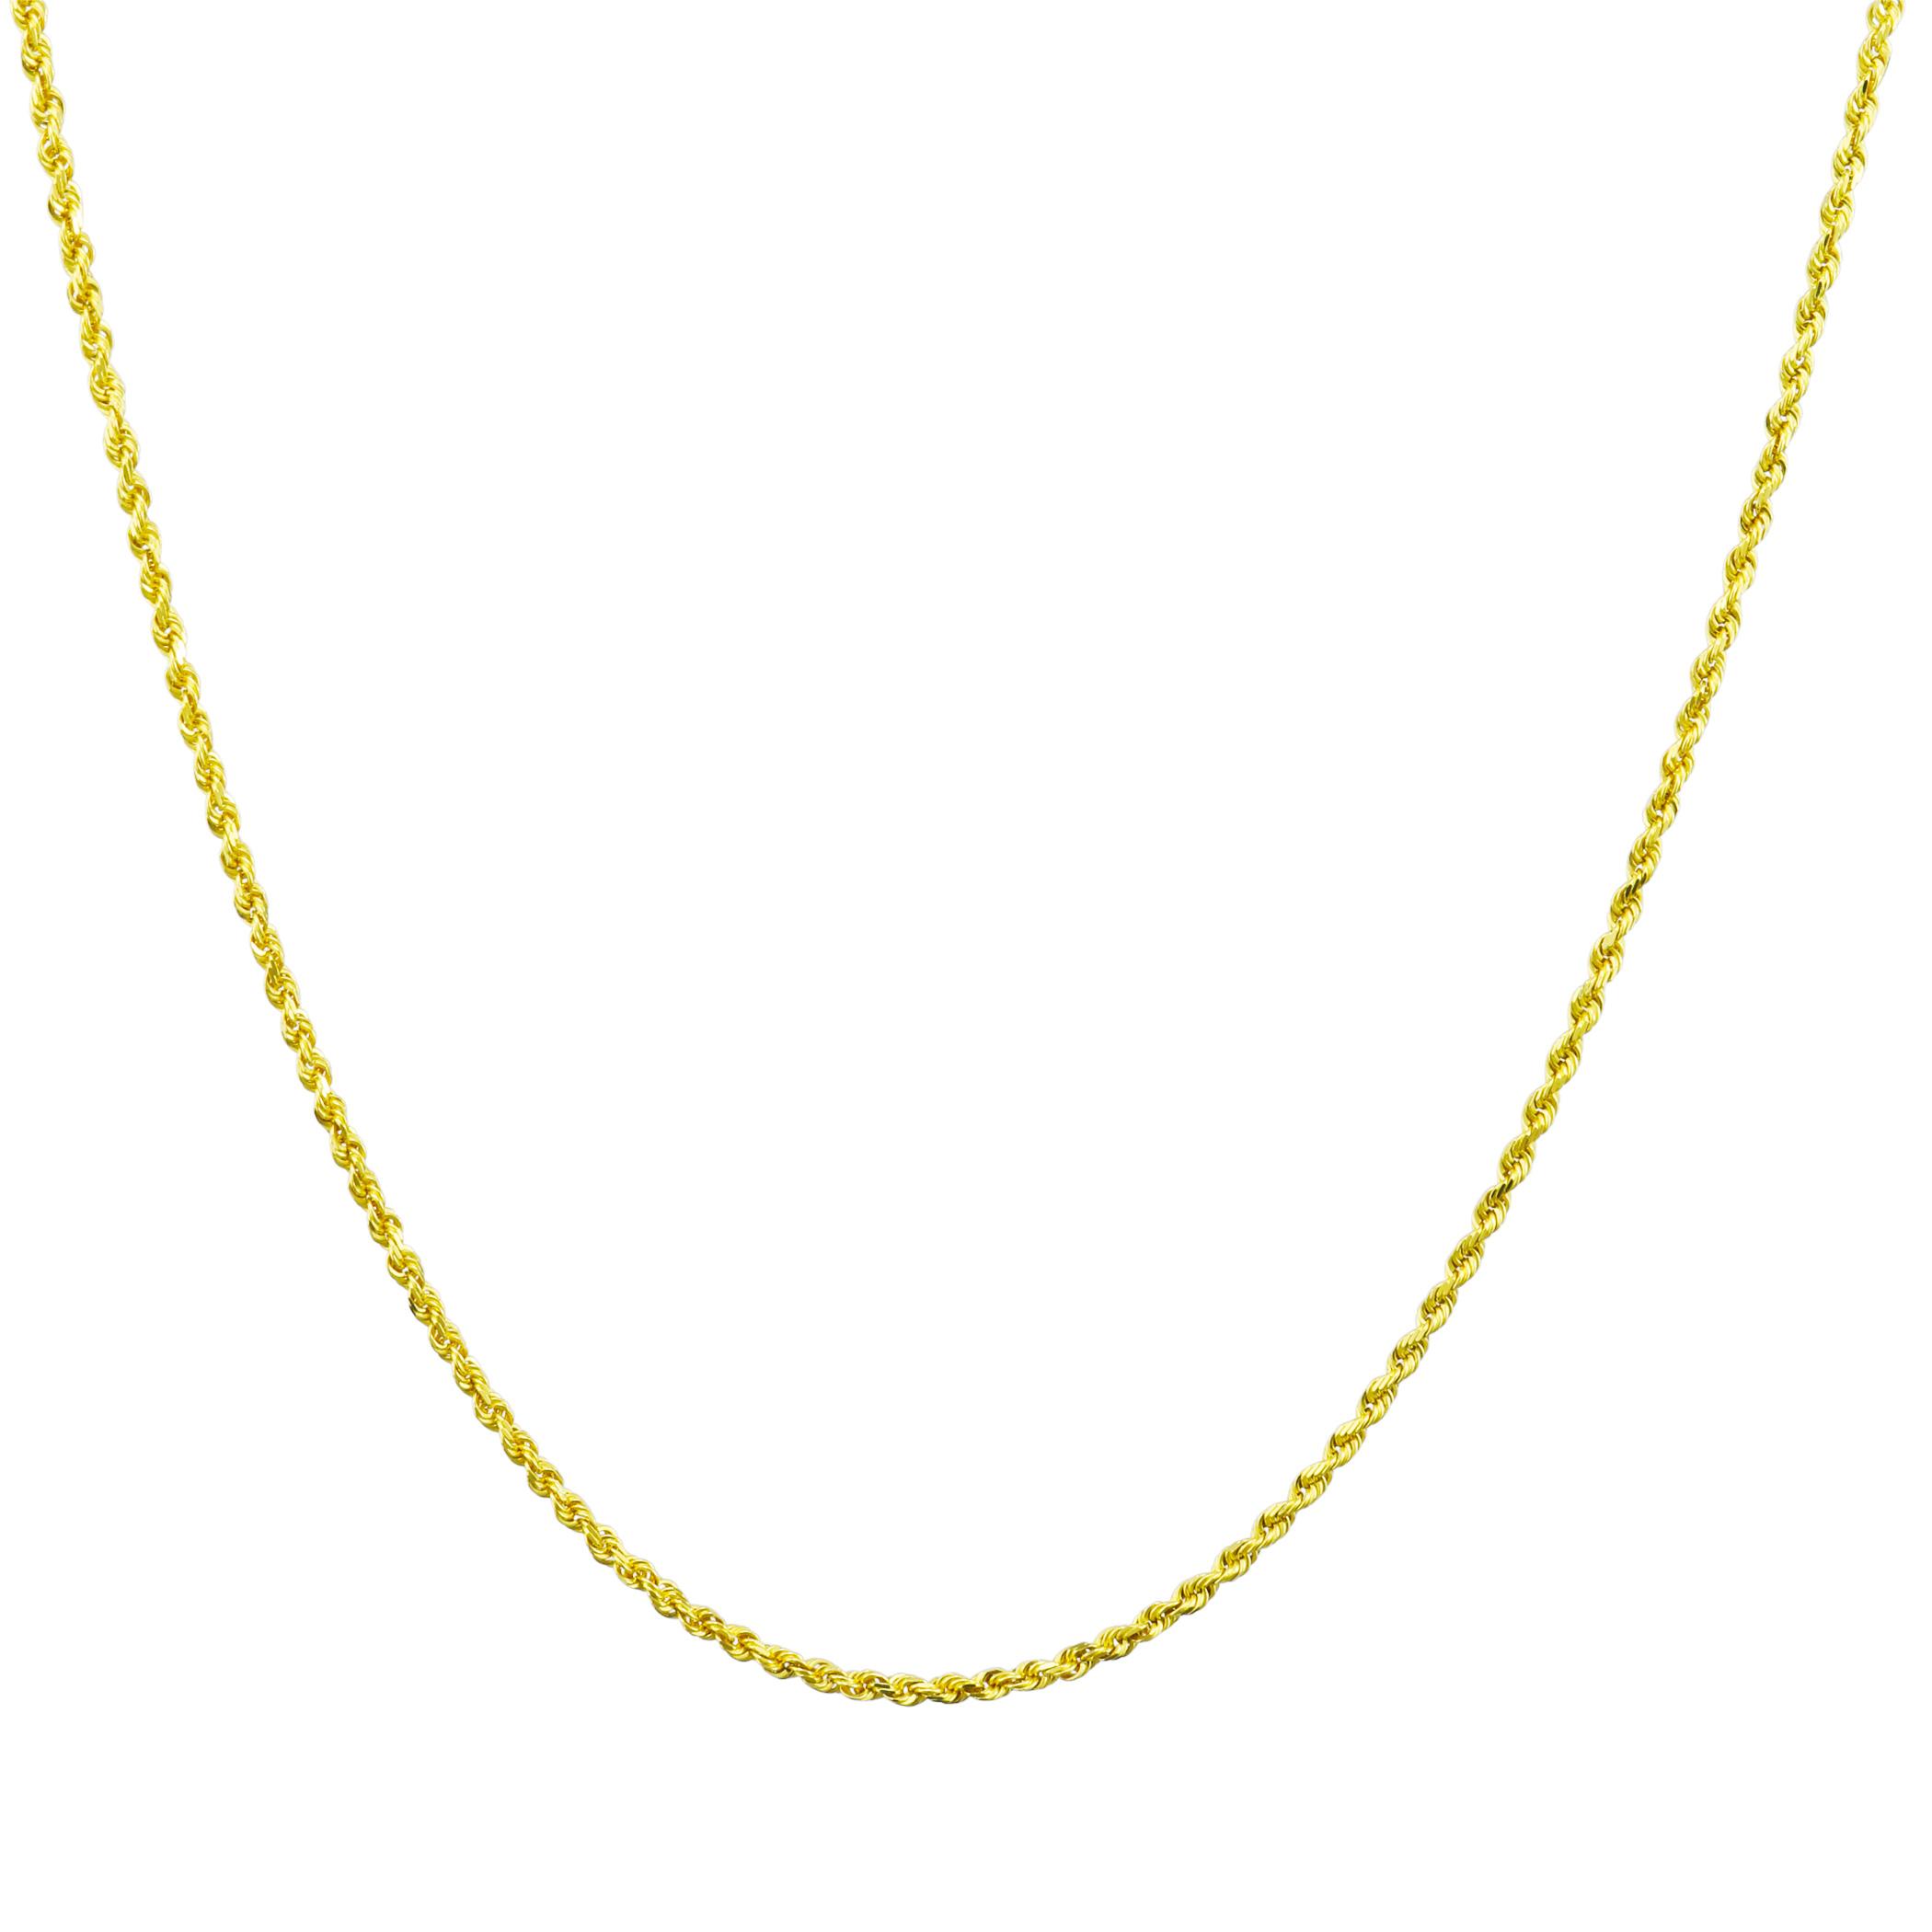 10K-Yellow-Gold-1-5mm-Thin-Diamond-Cut-Rope-Chain-Pendant-Necklace-Women-14-034-26-034 thumbnail 18